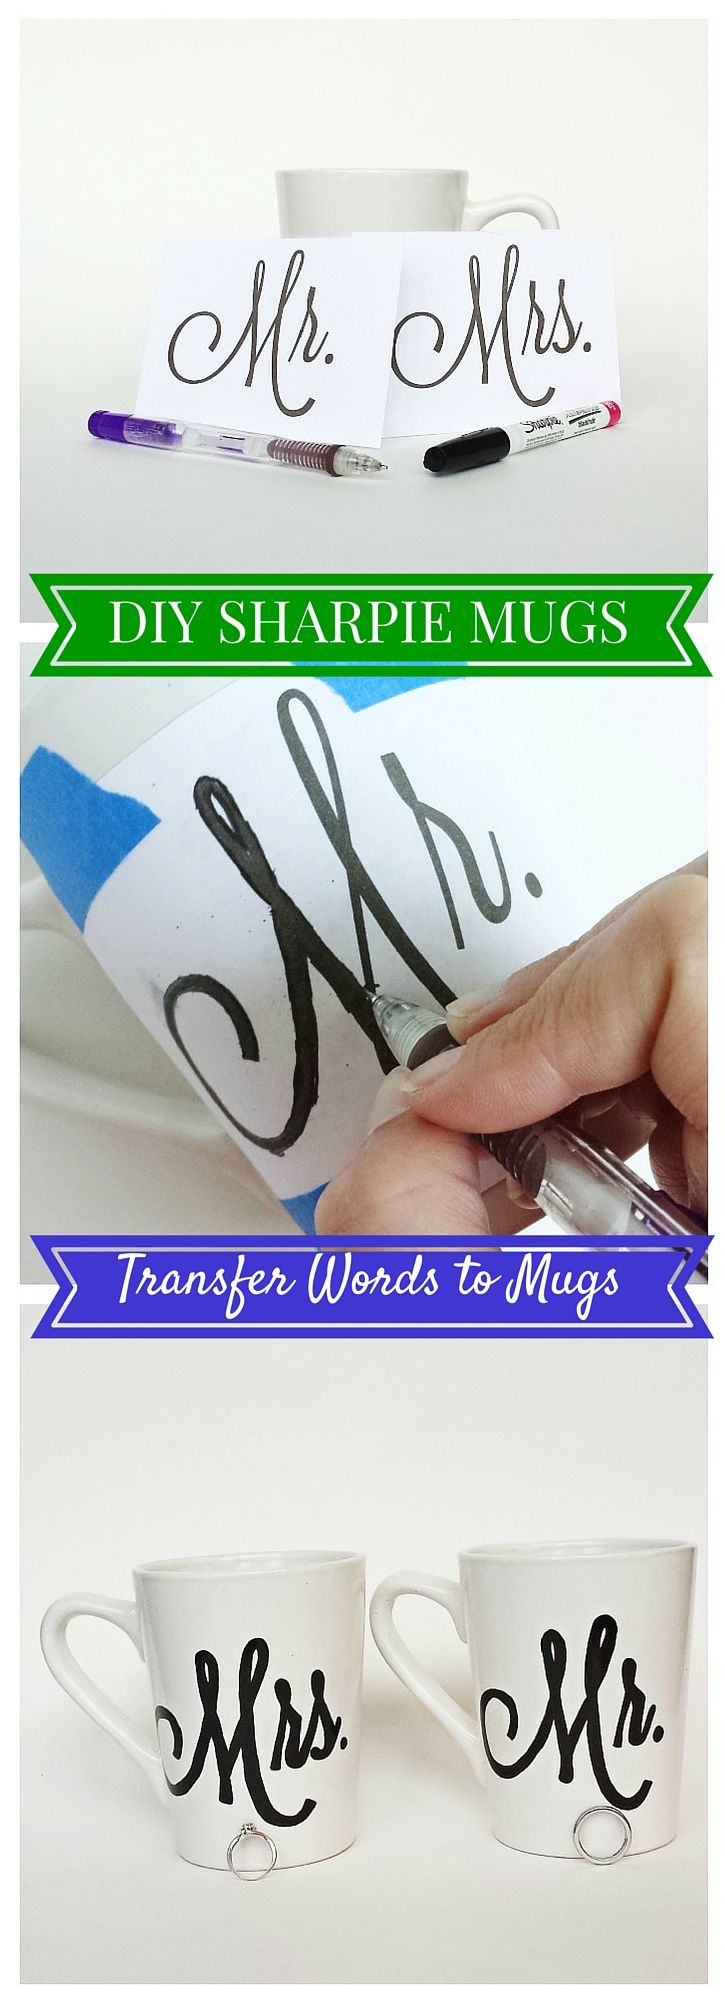 Sharpie Mugs {Transferring a Design}